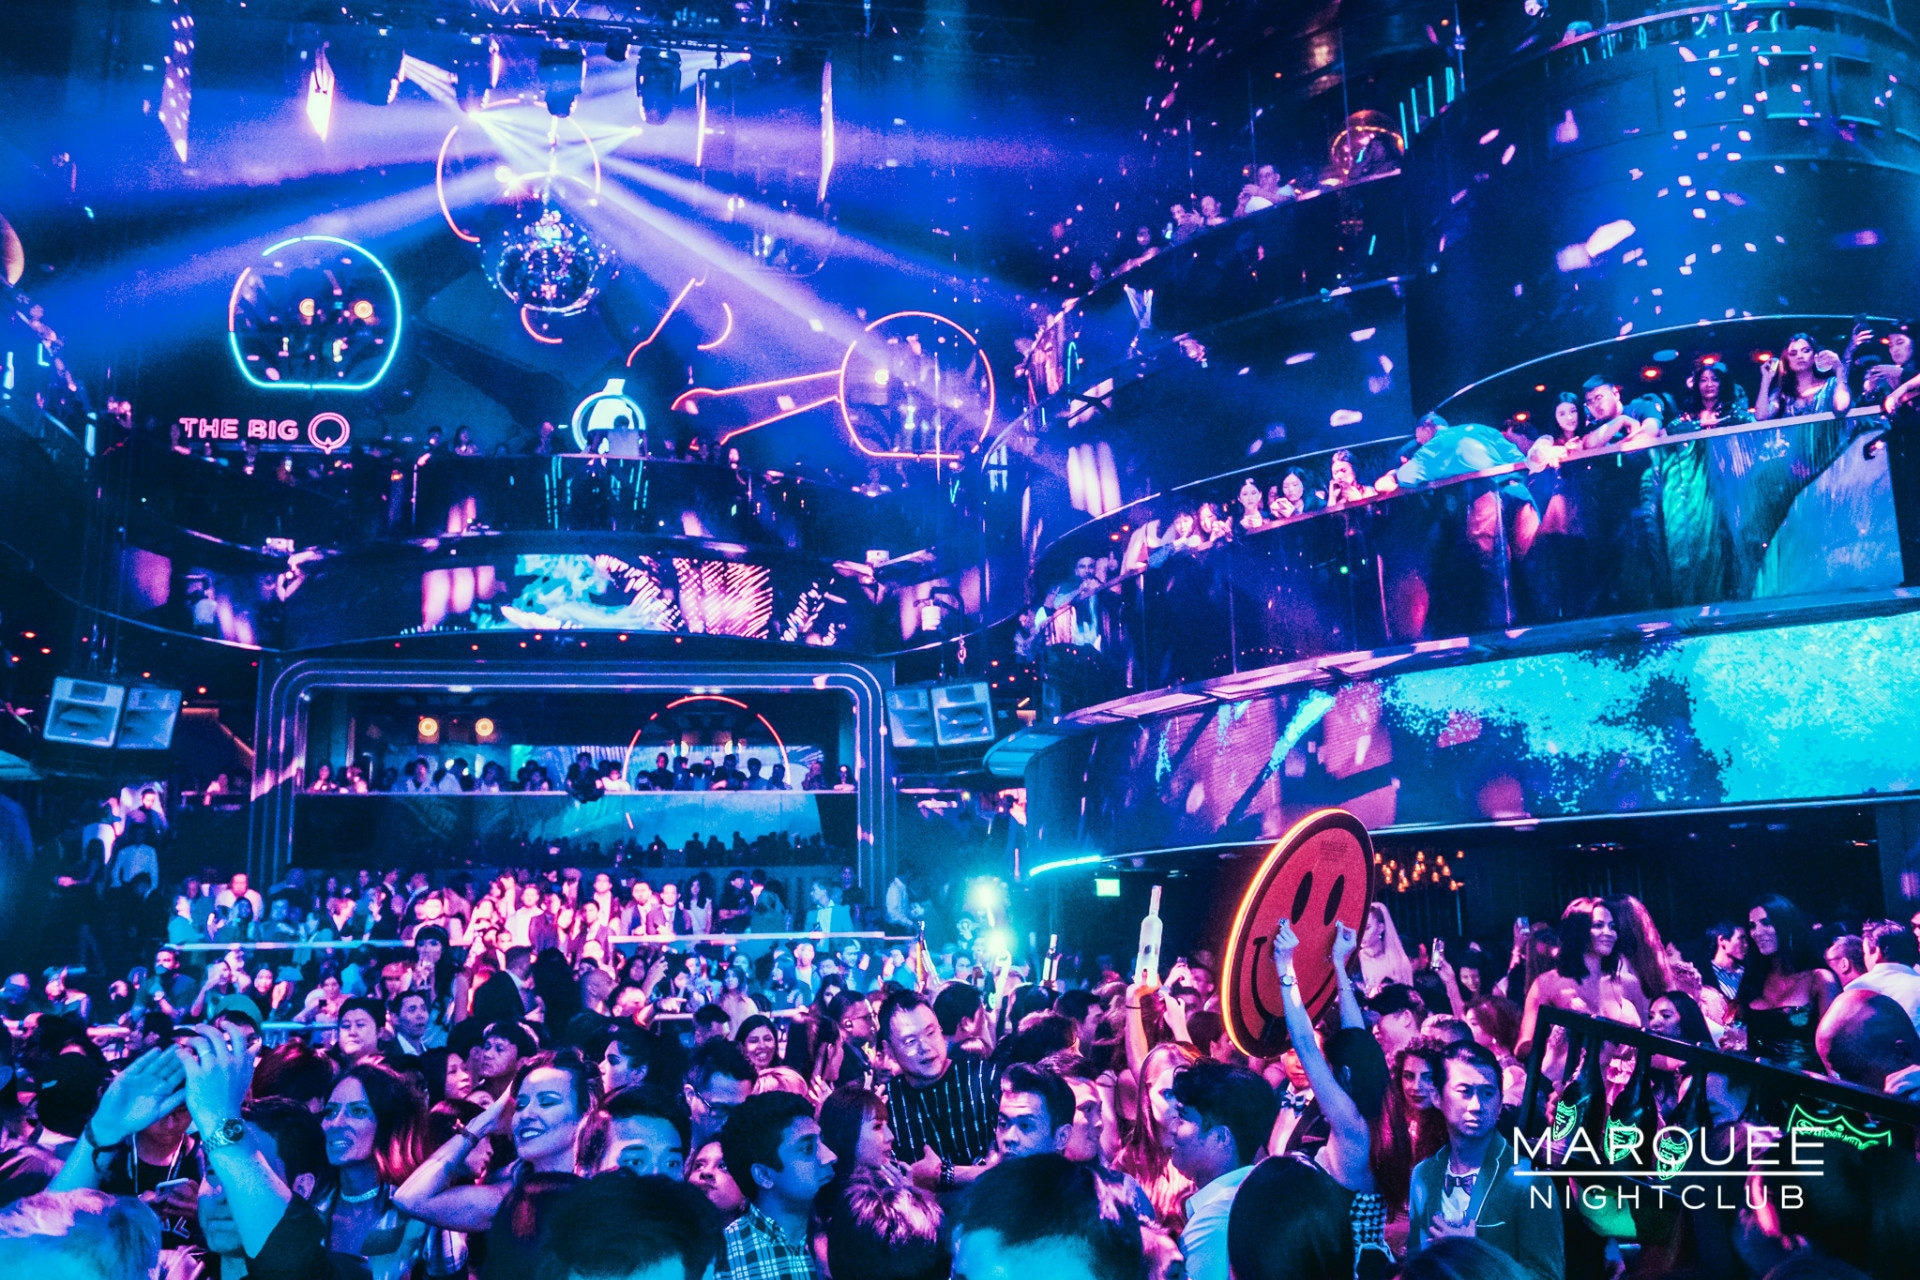 f85105e18599 MARQUEE Nightclub Singapore | Nightlife | Marina Bay Sands